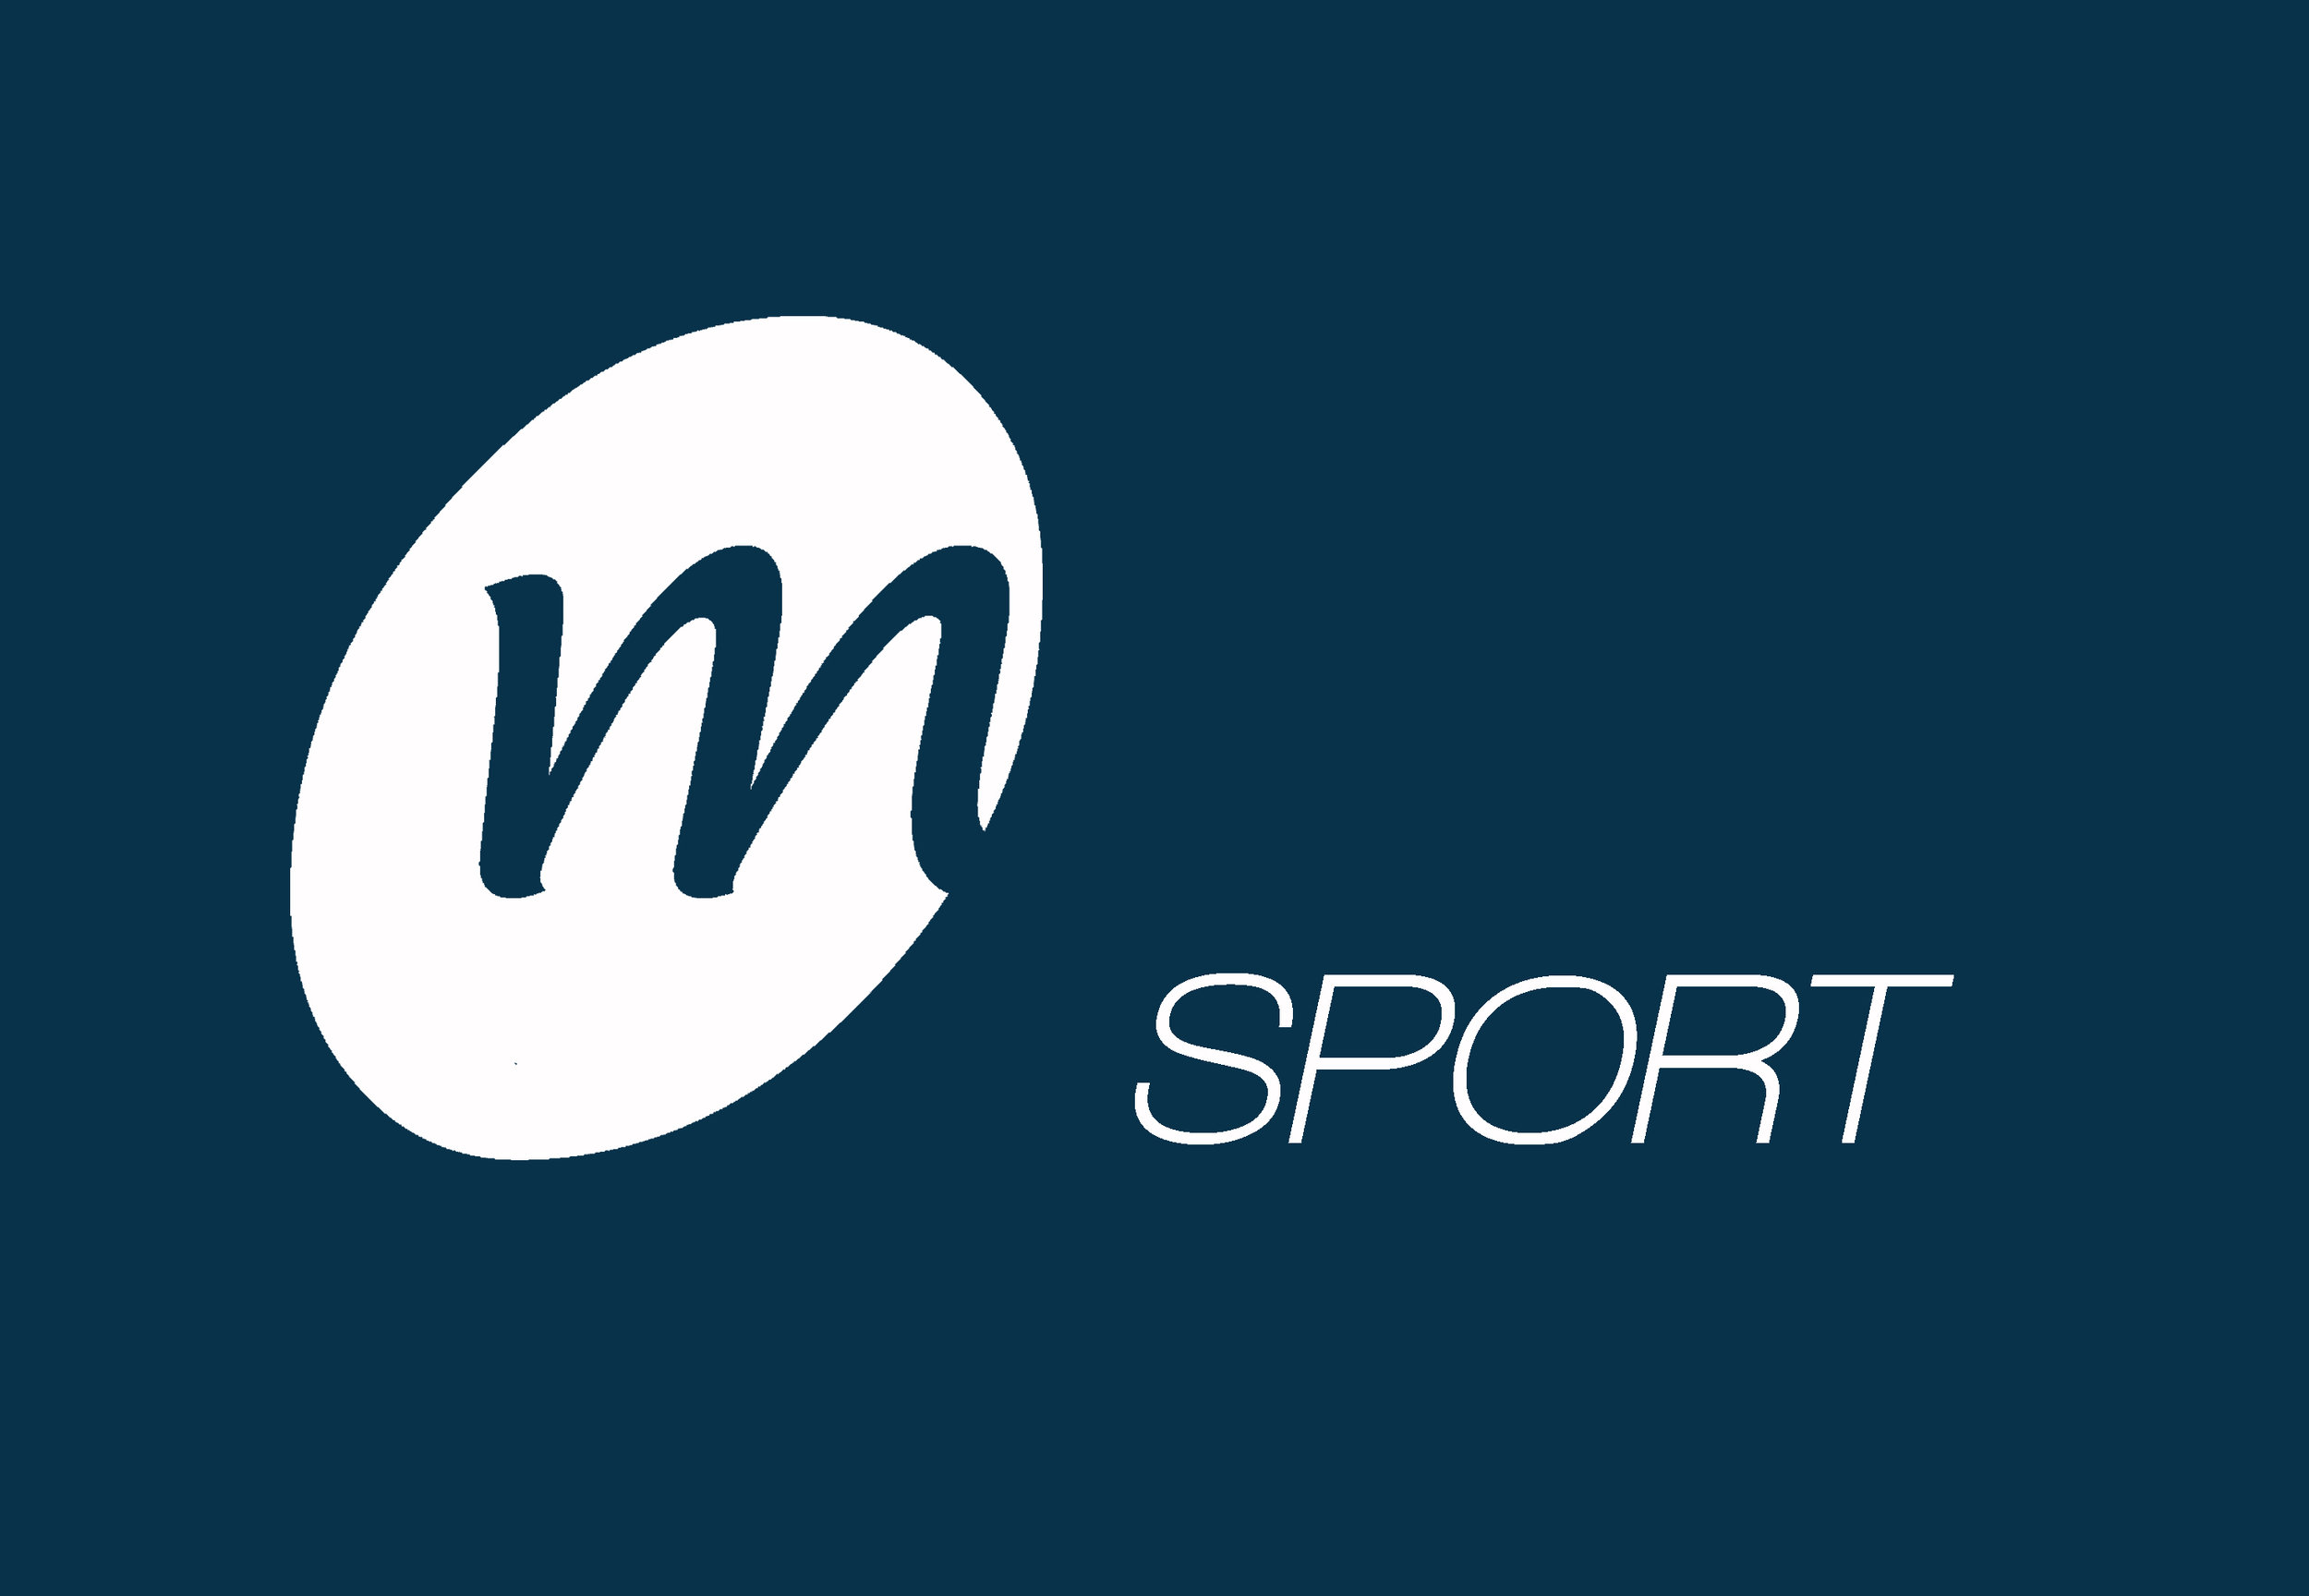 OMCsport.jpg